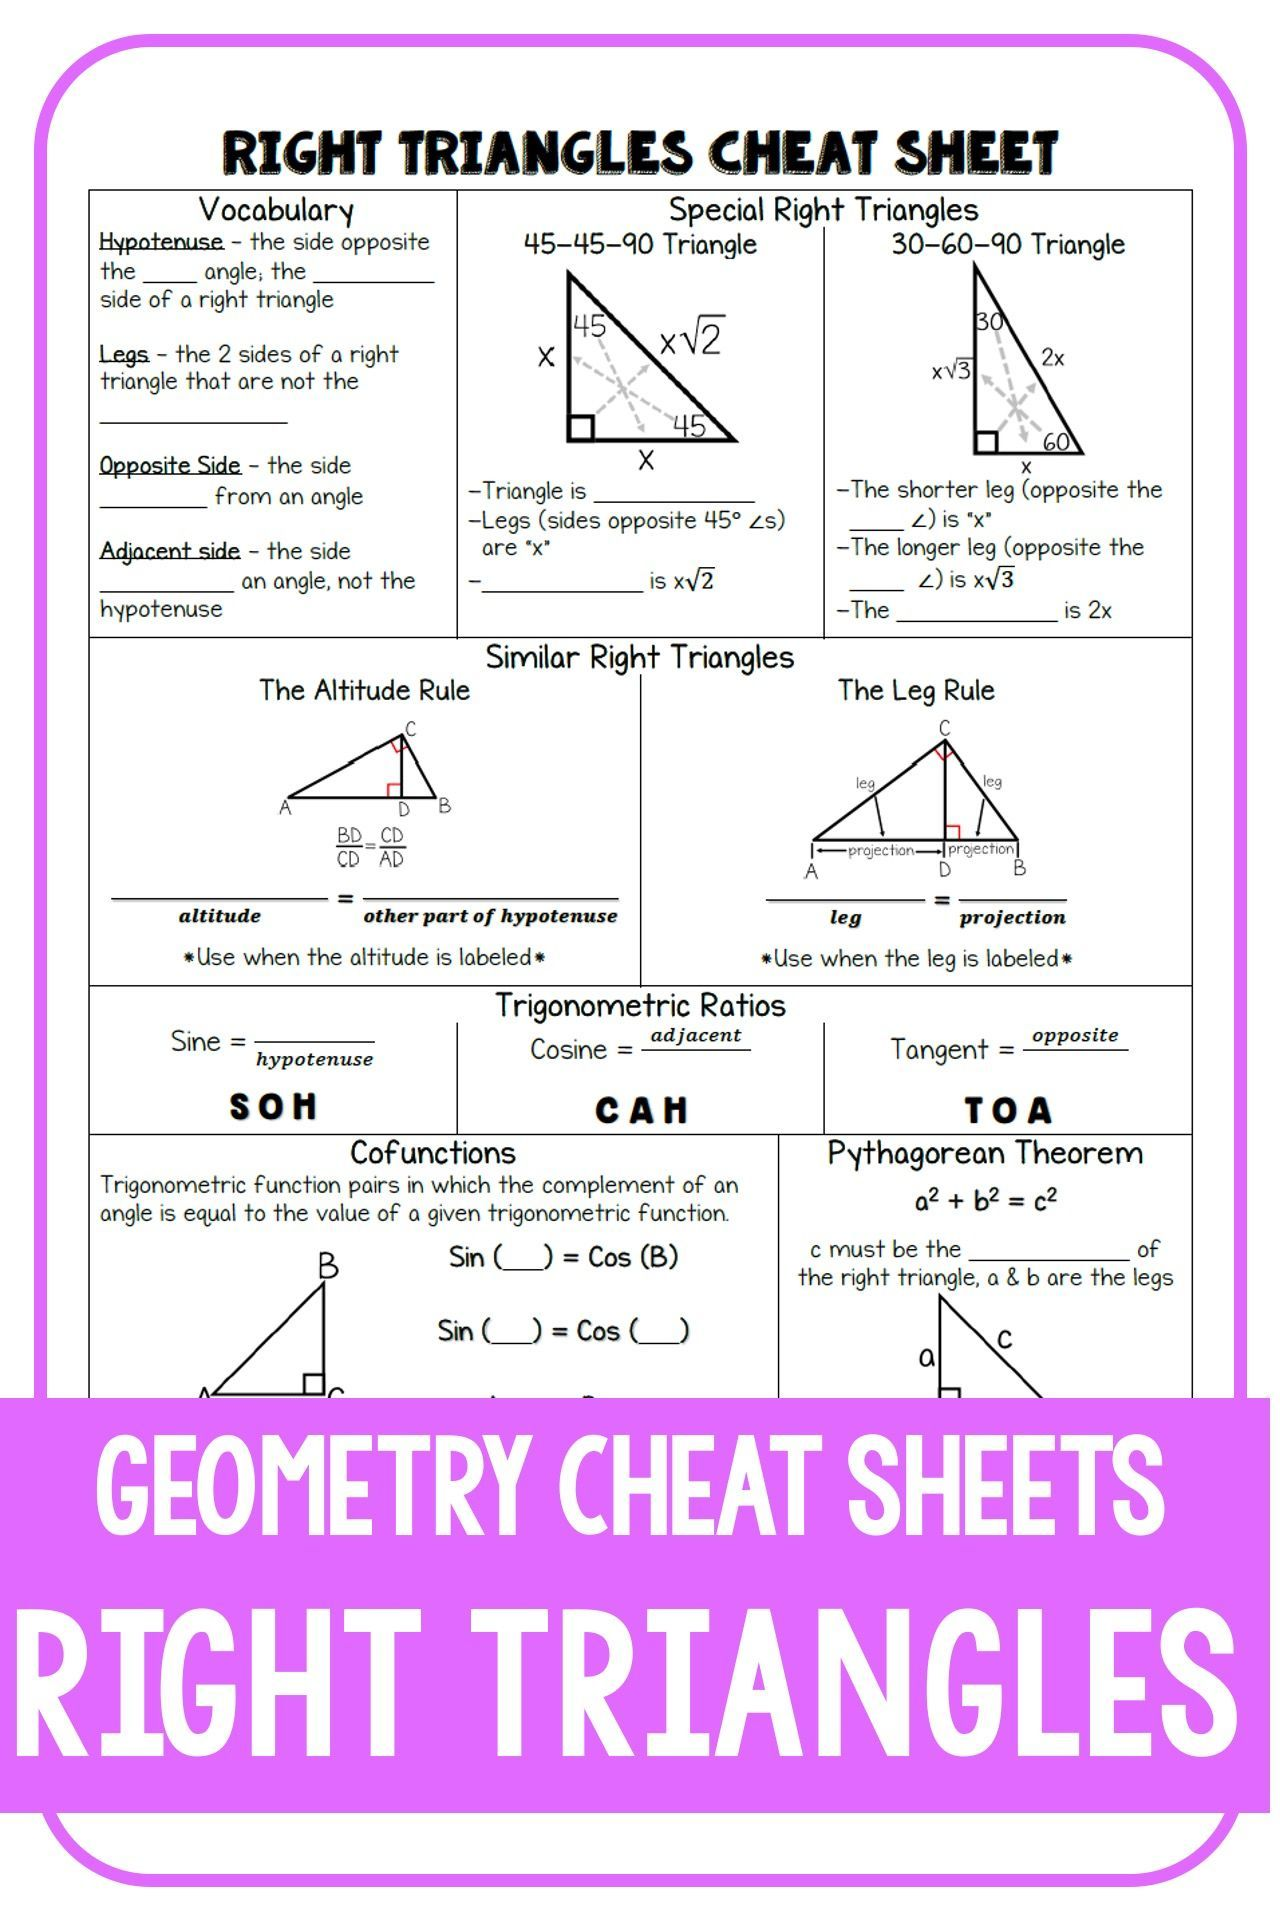 hight resolution of Geometry Cheat Sheet: Right Triangles   High school math teacher